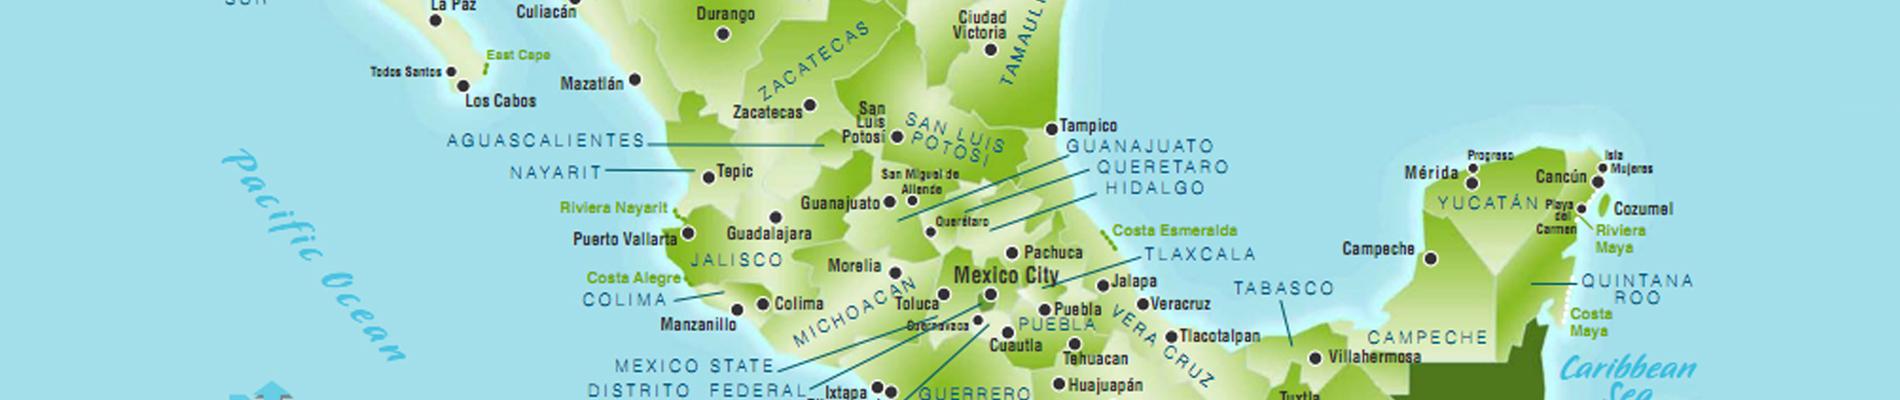 Mexico Tourism: Facts & Statistics 2016 - Journey Mexico